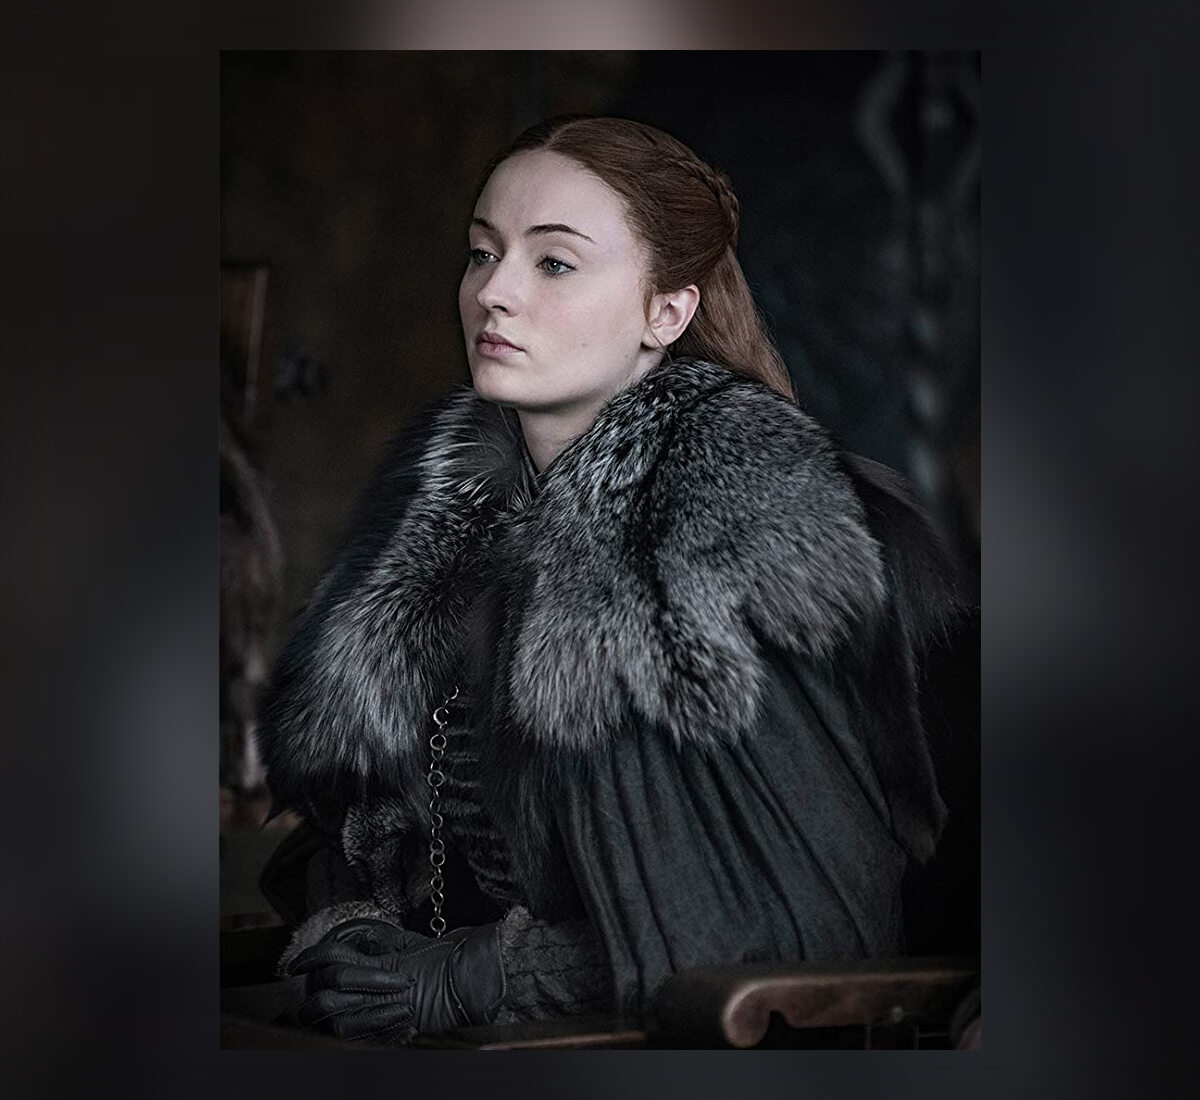 Sansa Stark w 8. sezonie serialu Teraz Sophie Turner ma 23 lata.